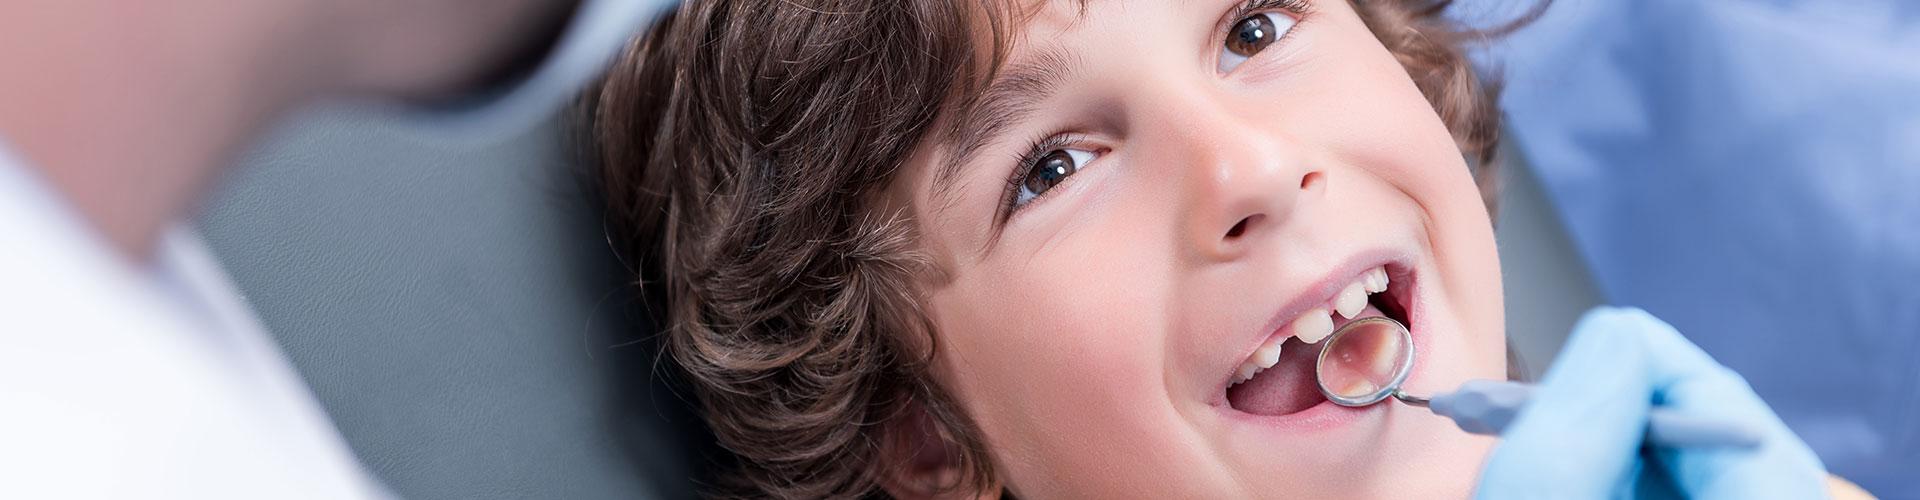 Child having dental check up